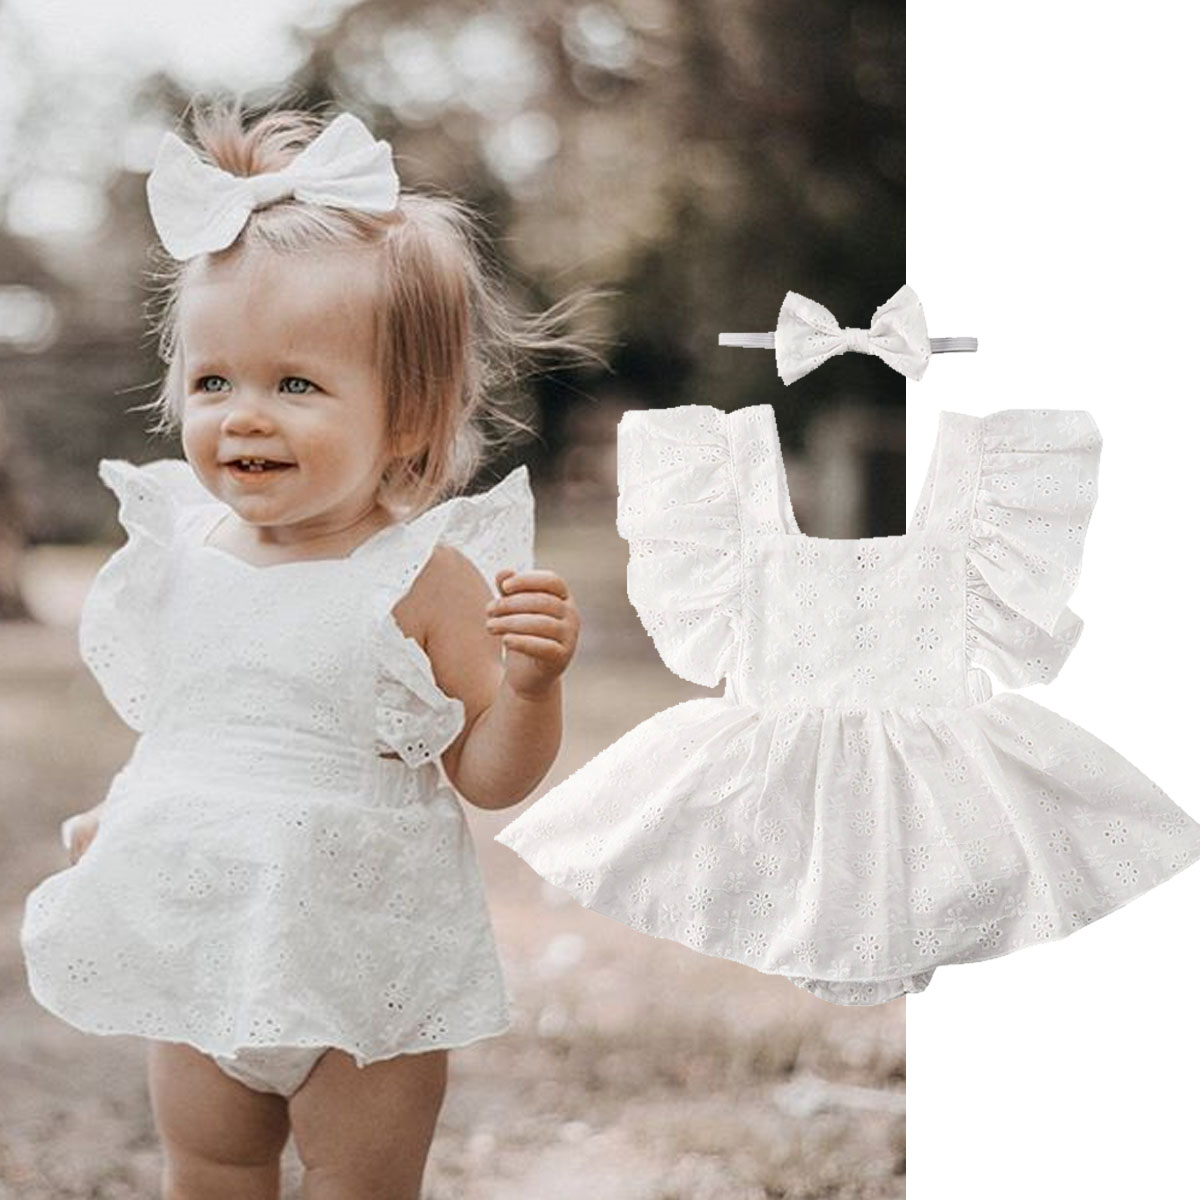 2020 Infant Newborn Baby Girl Romper Dress Clothes Summer White Lace Princess Dress Bodysuit Girls Tutu Dresses Outfits 0-24M